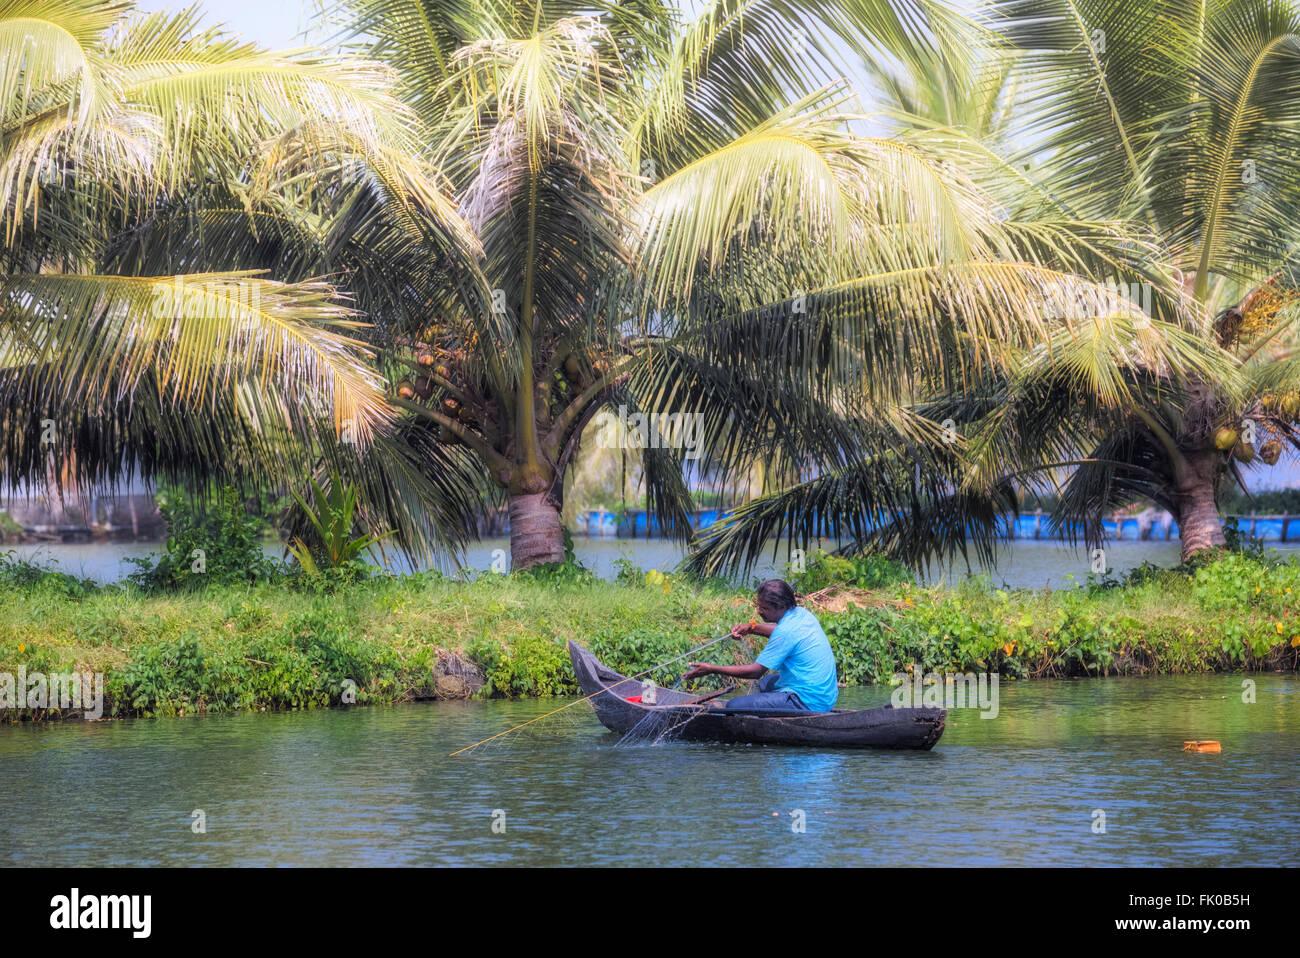 fisherman in Kochi, Kerala, India, Asia - Stock Image